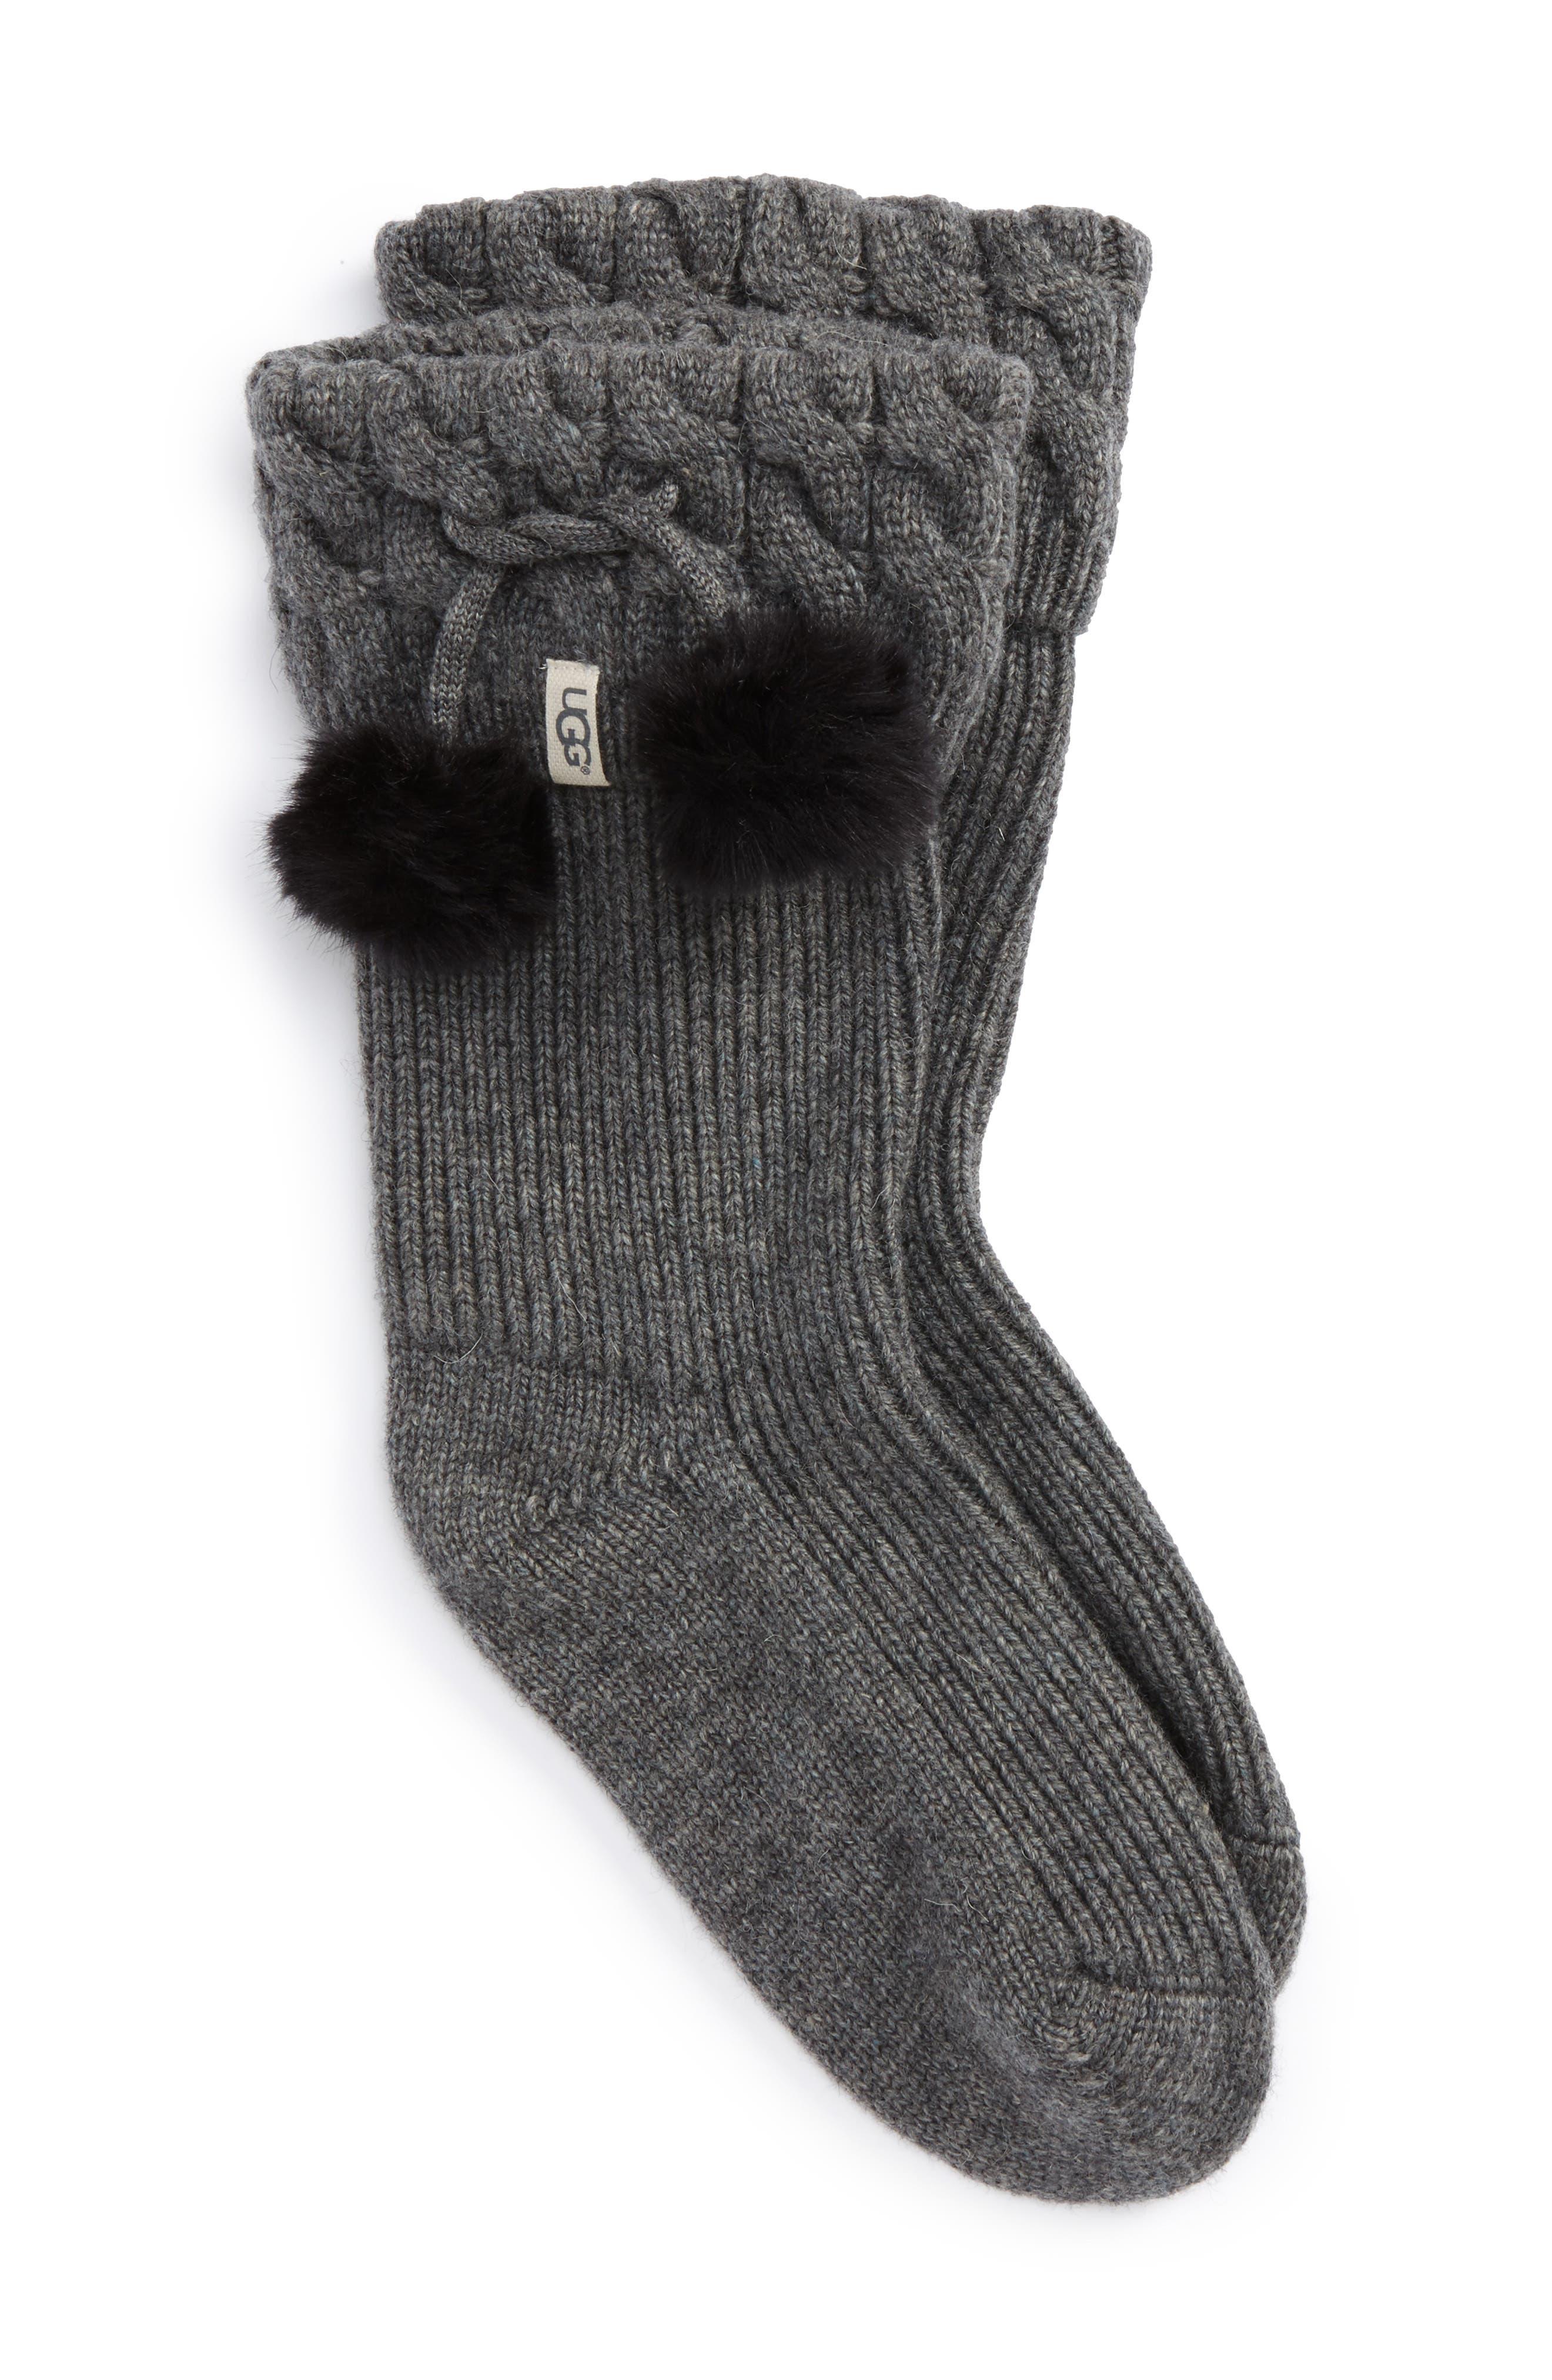 UGGpure<sup>™</sup> Pompom Short Rain Boot Sock,                         Main,                         color, CHARCOAL HEATHER WOOL